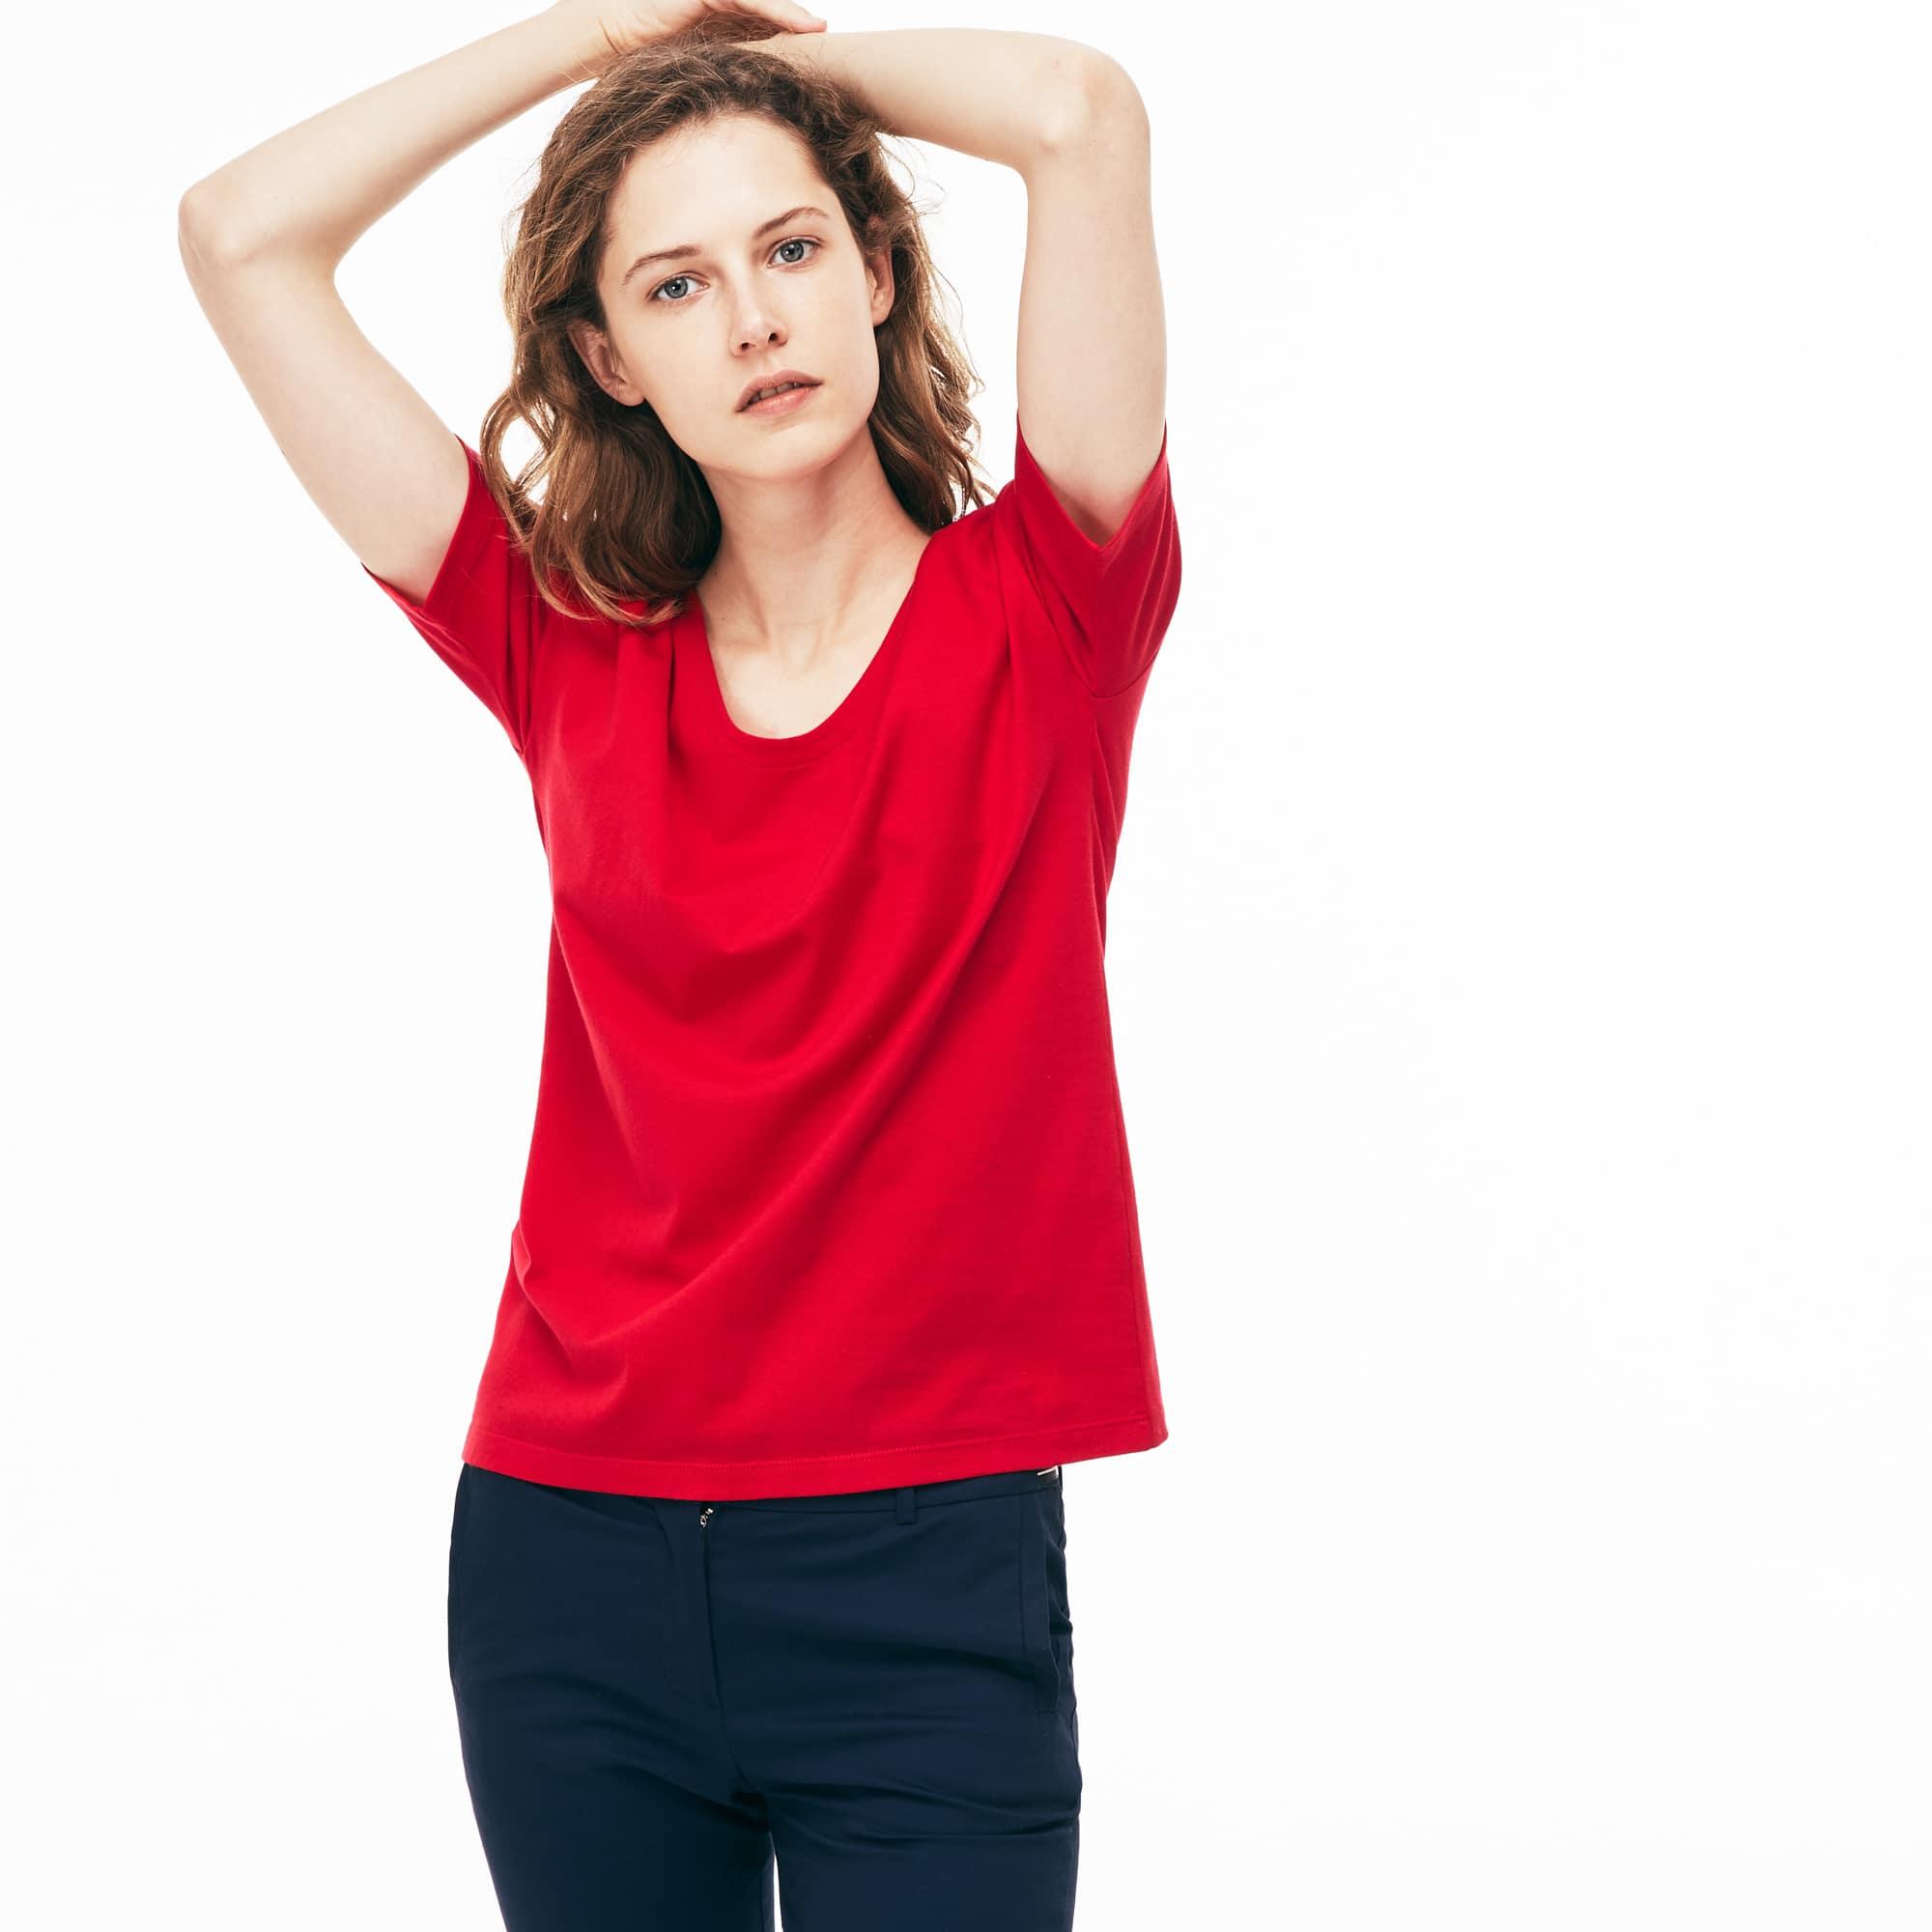 T-shirt con collo svasato in jersey di cotone morbido tinta unita